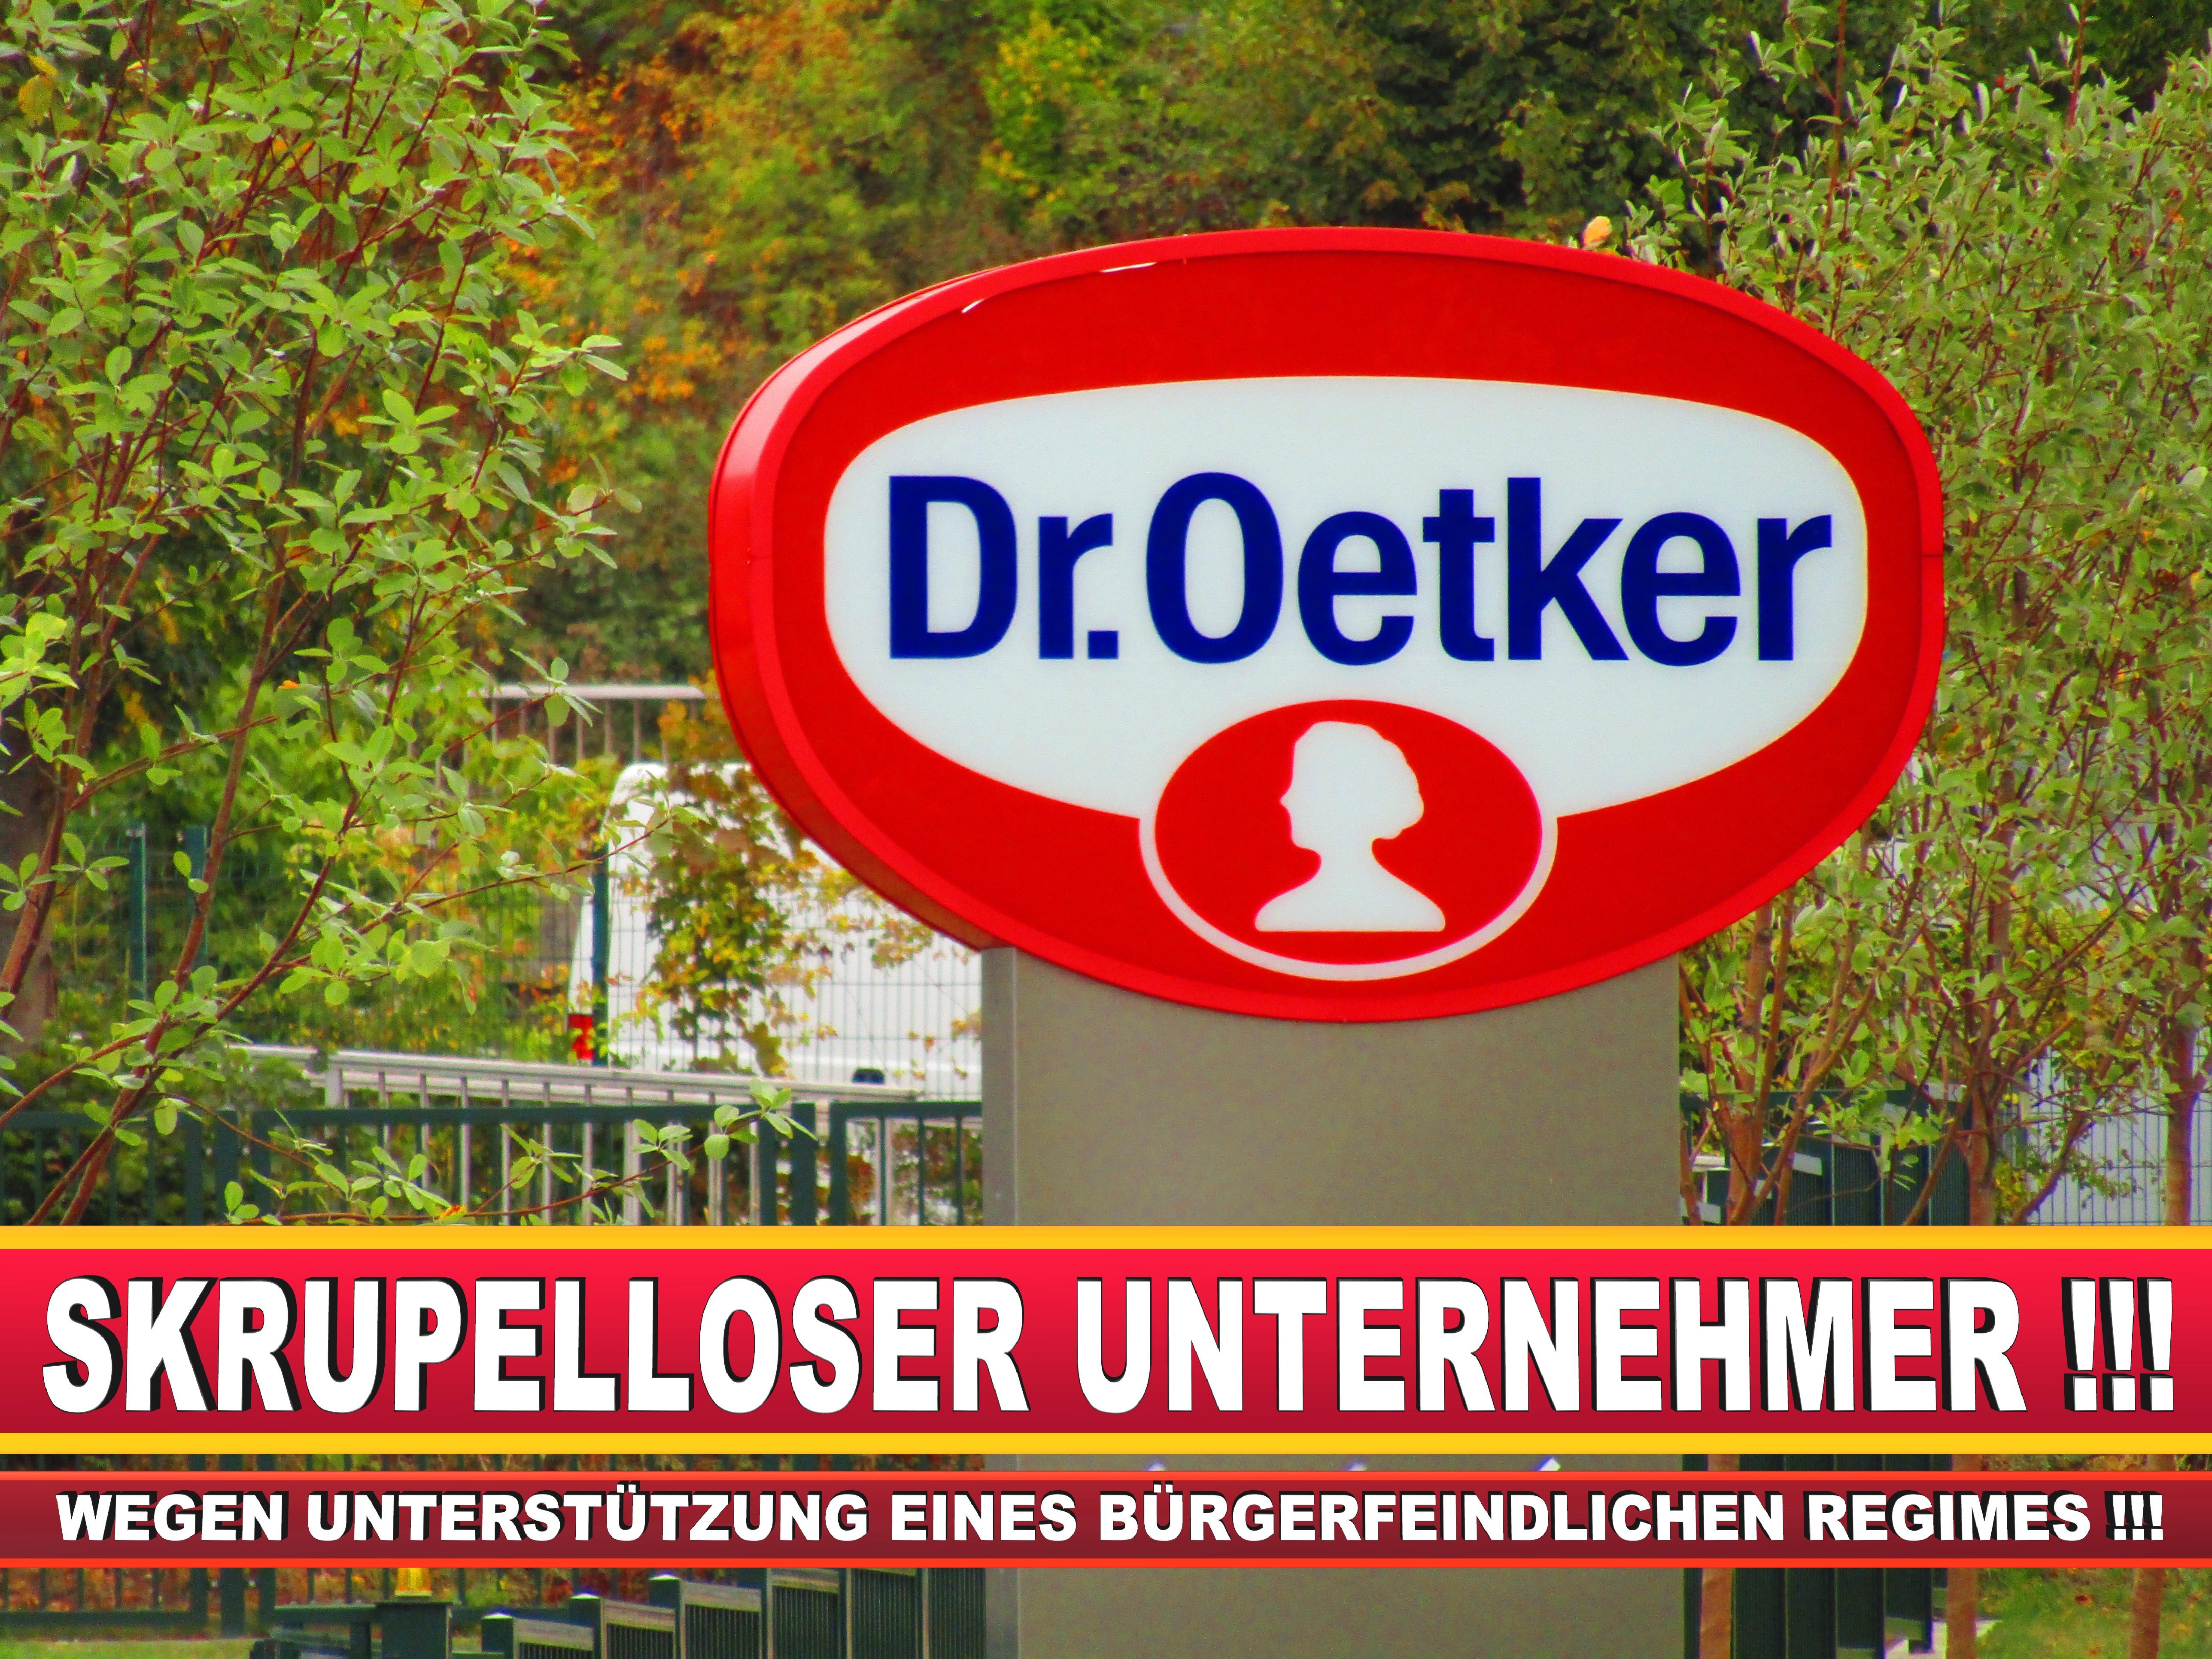 Dr Oetker Bielefeld CDU Bielefeld Spendengelder Skandal Richard August (2)